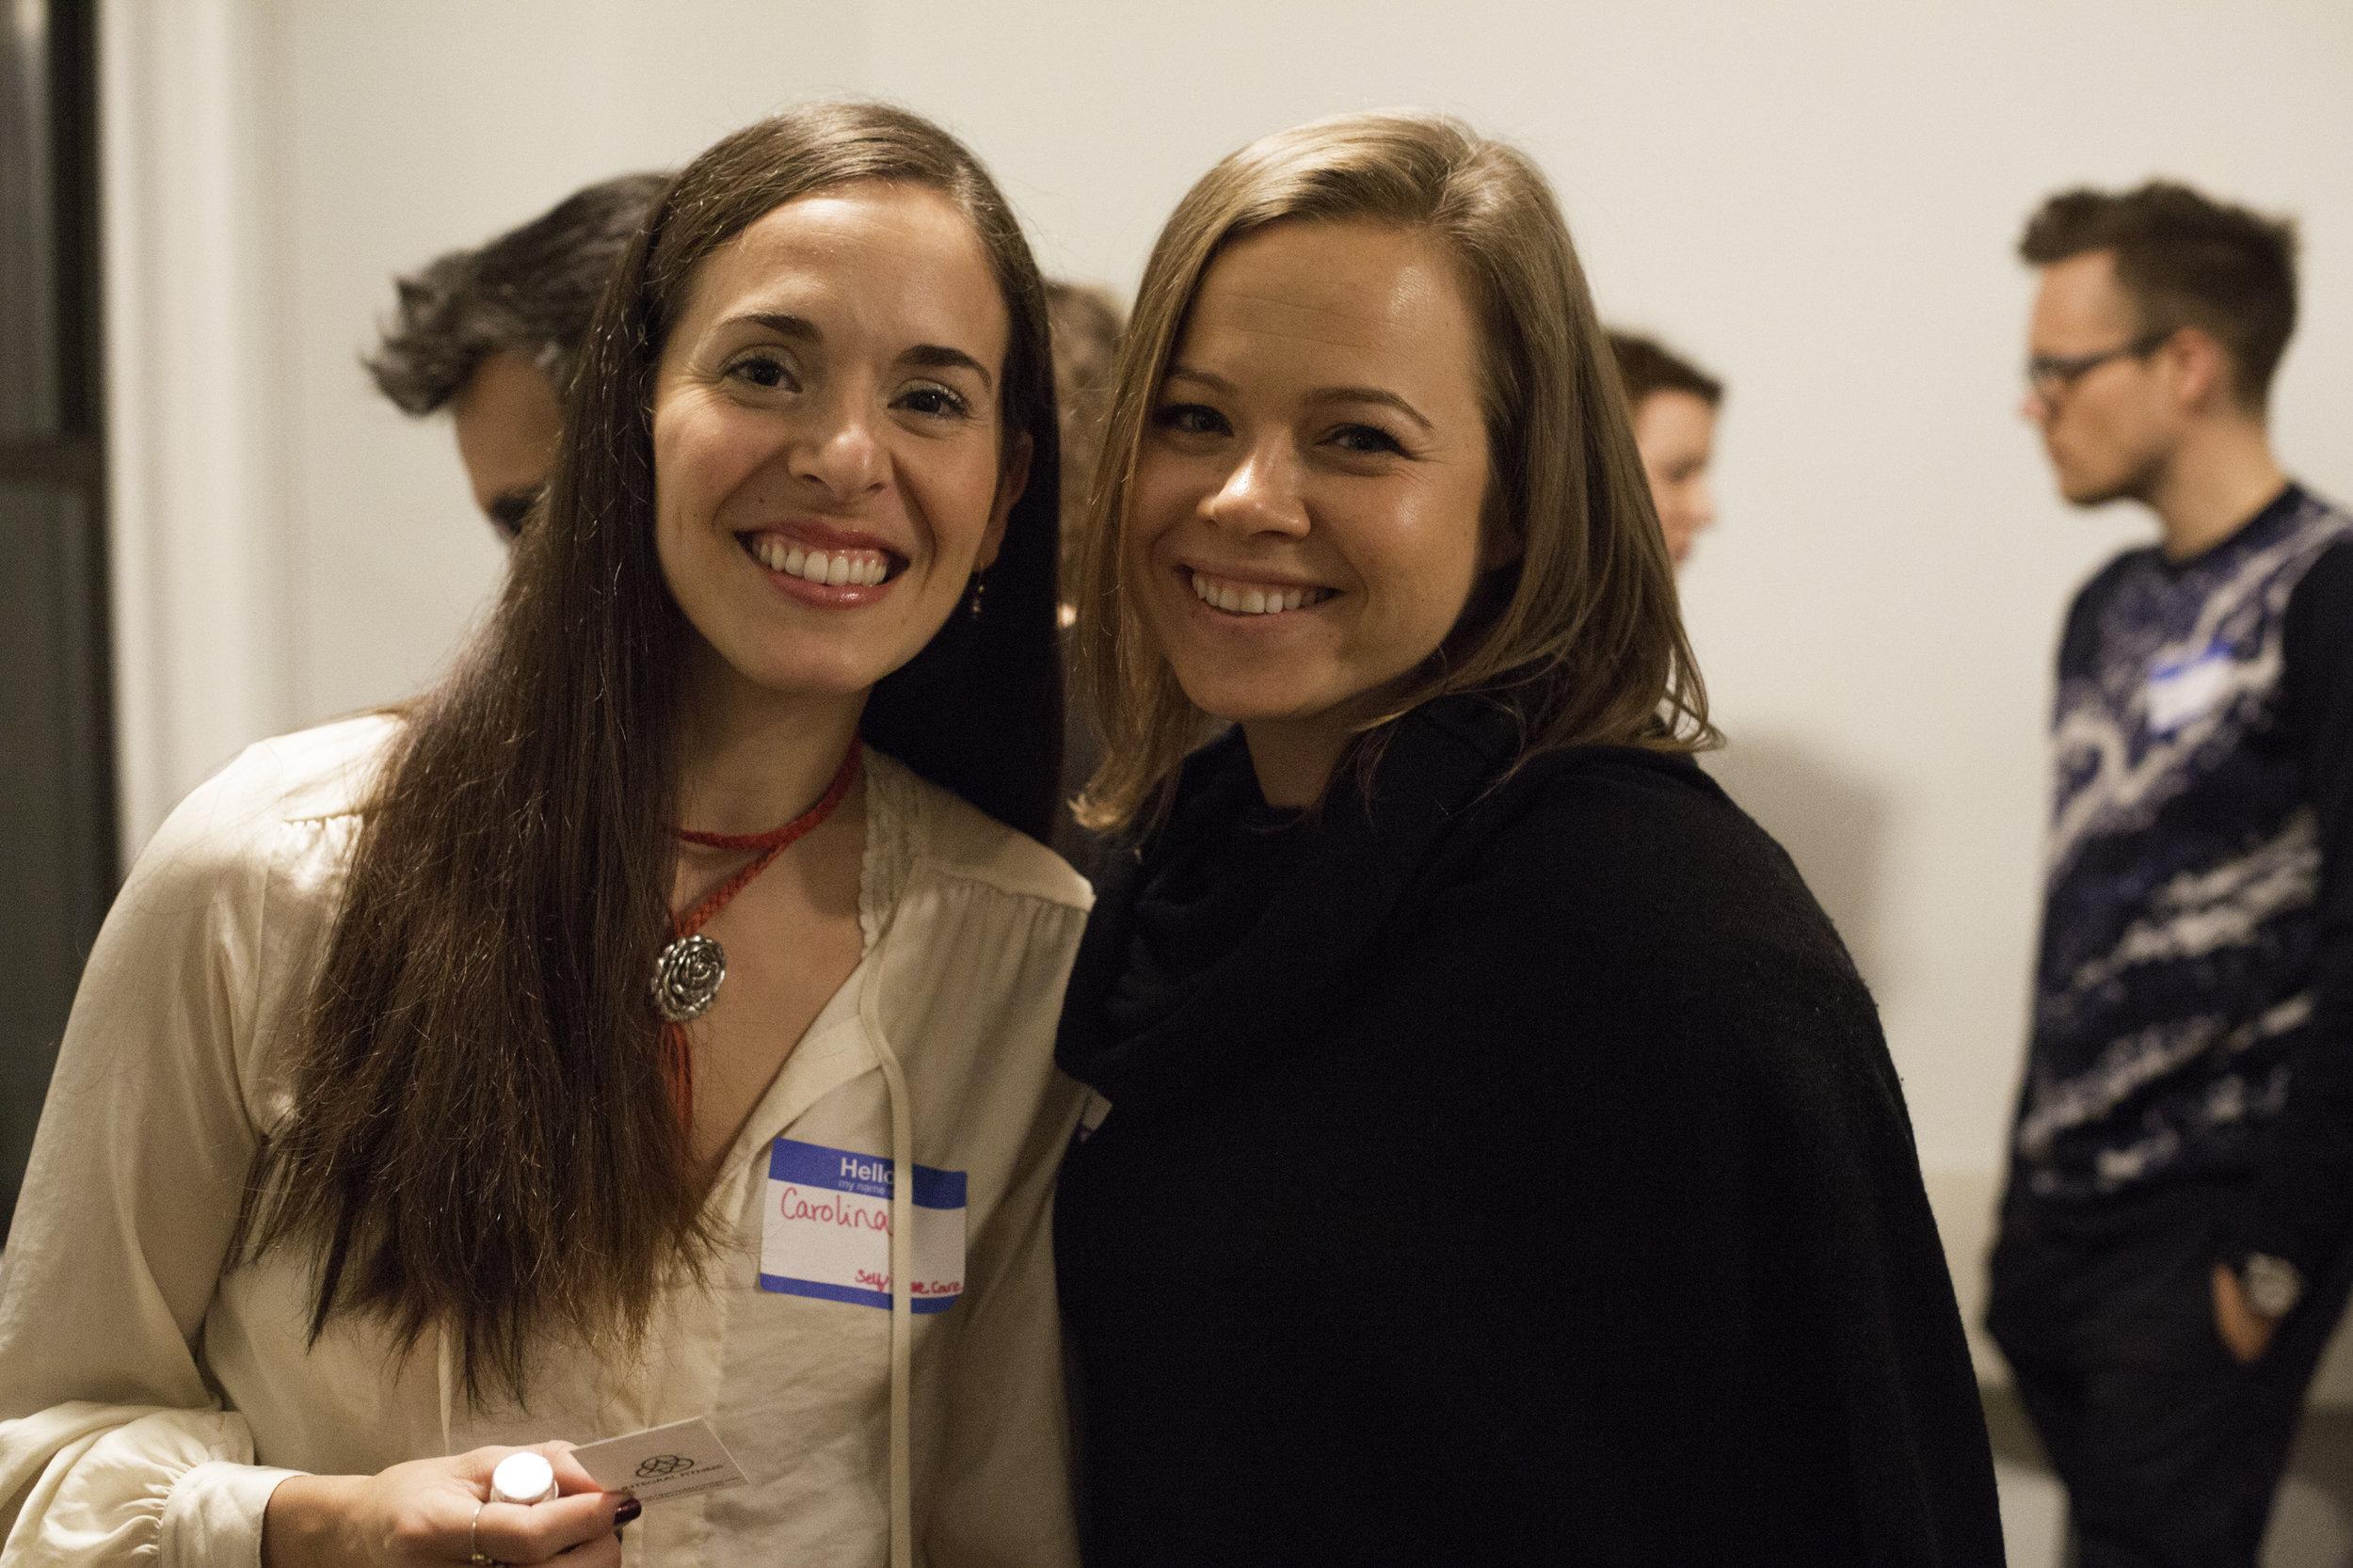 Here with Dasha the event organizer. Thanks Dasha!